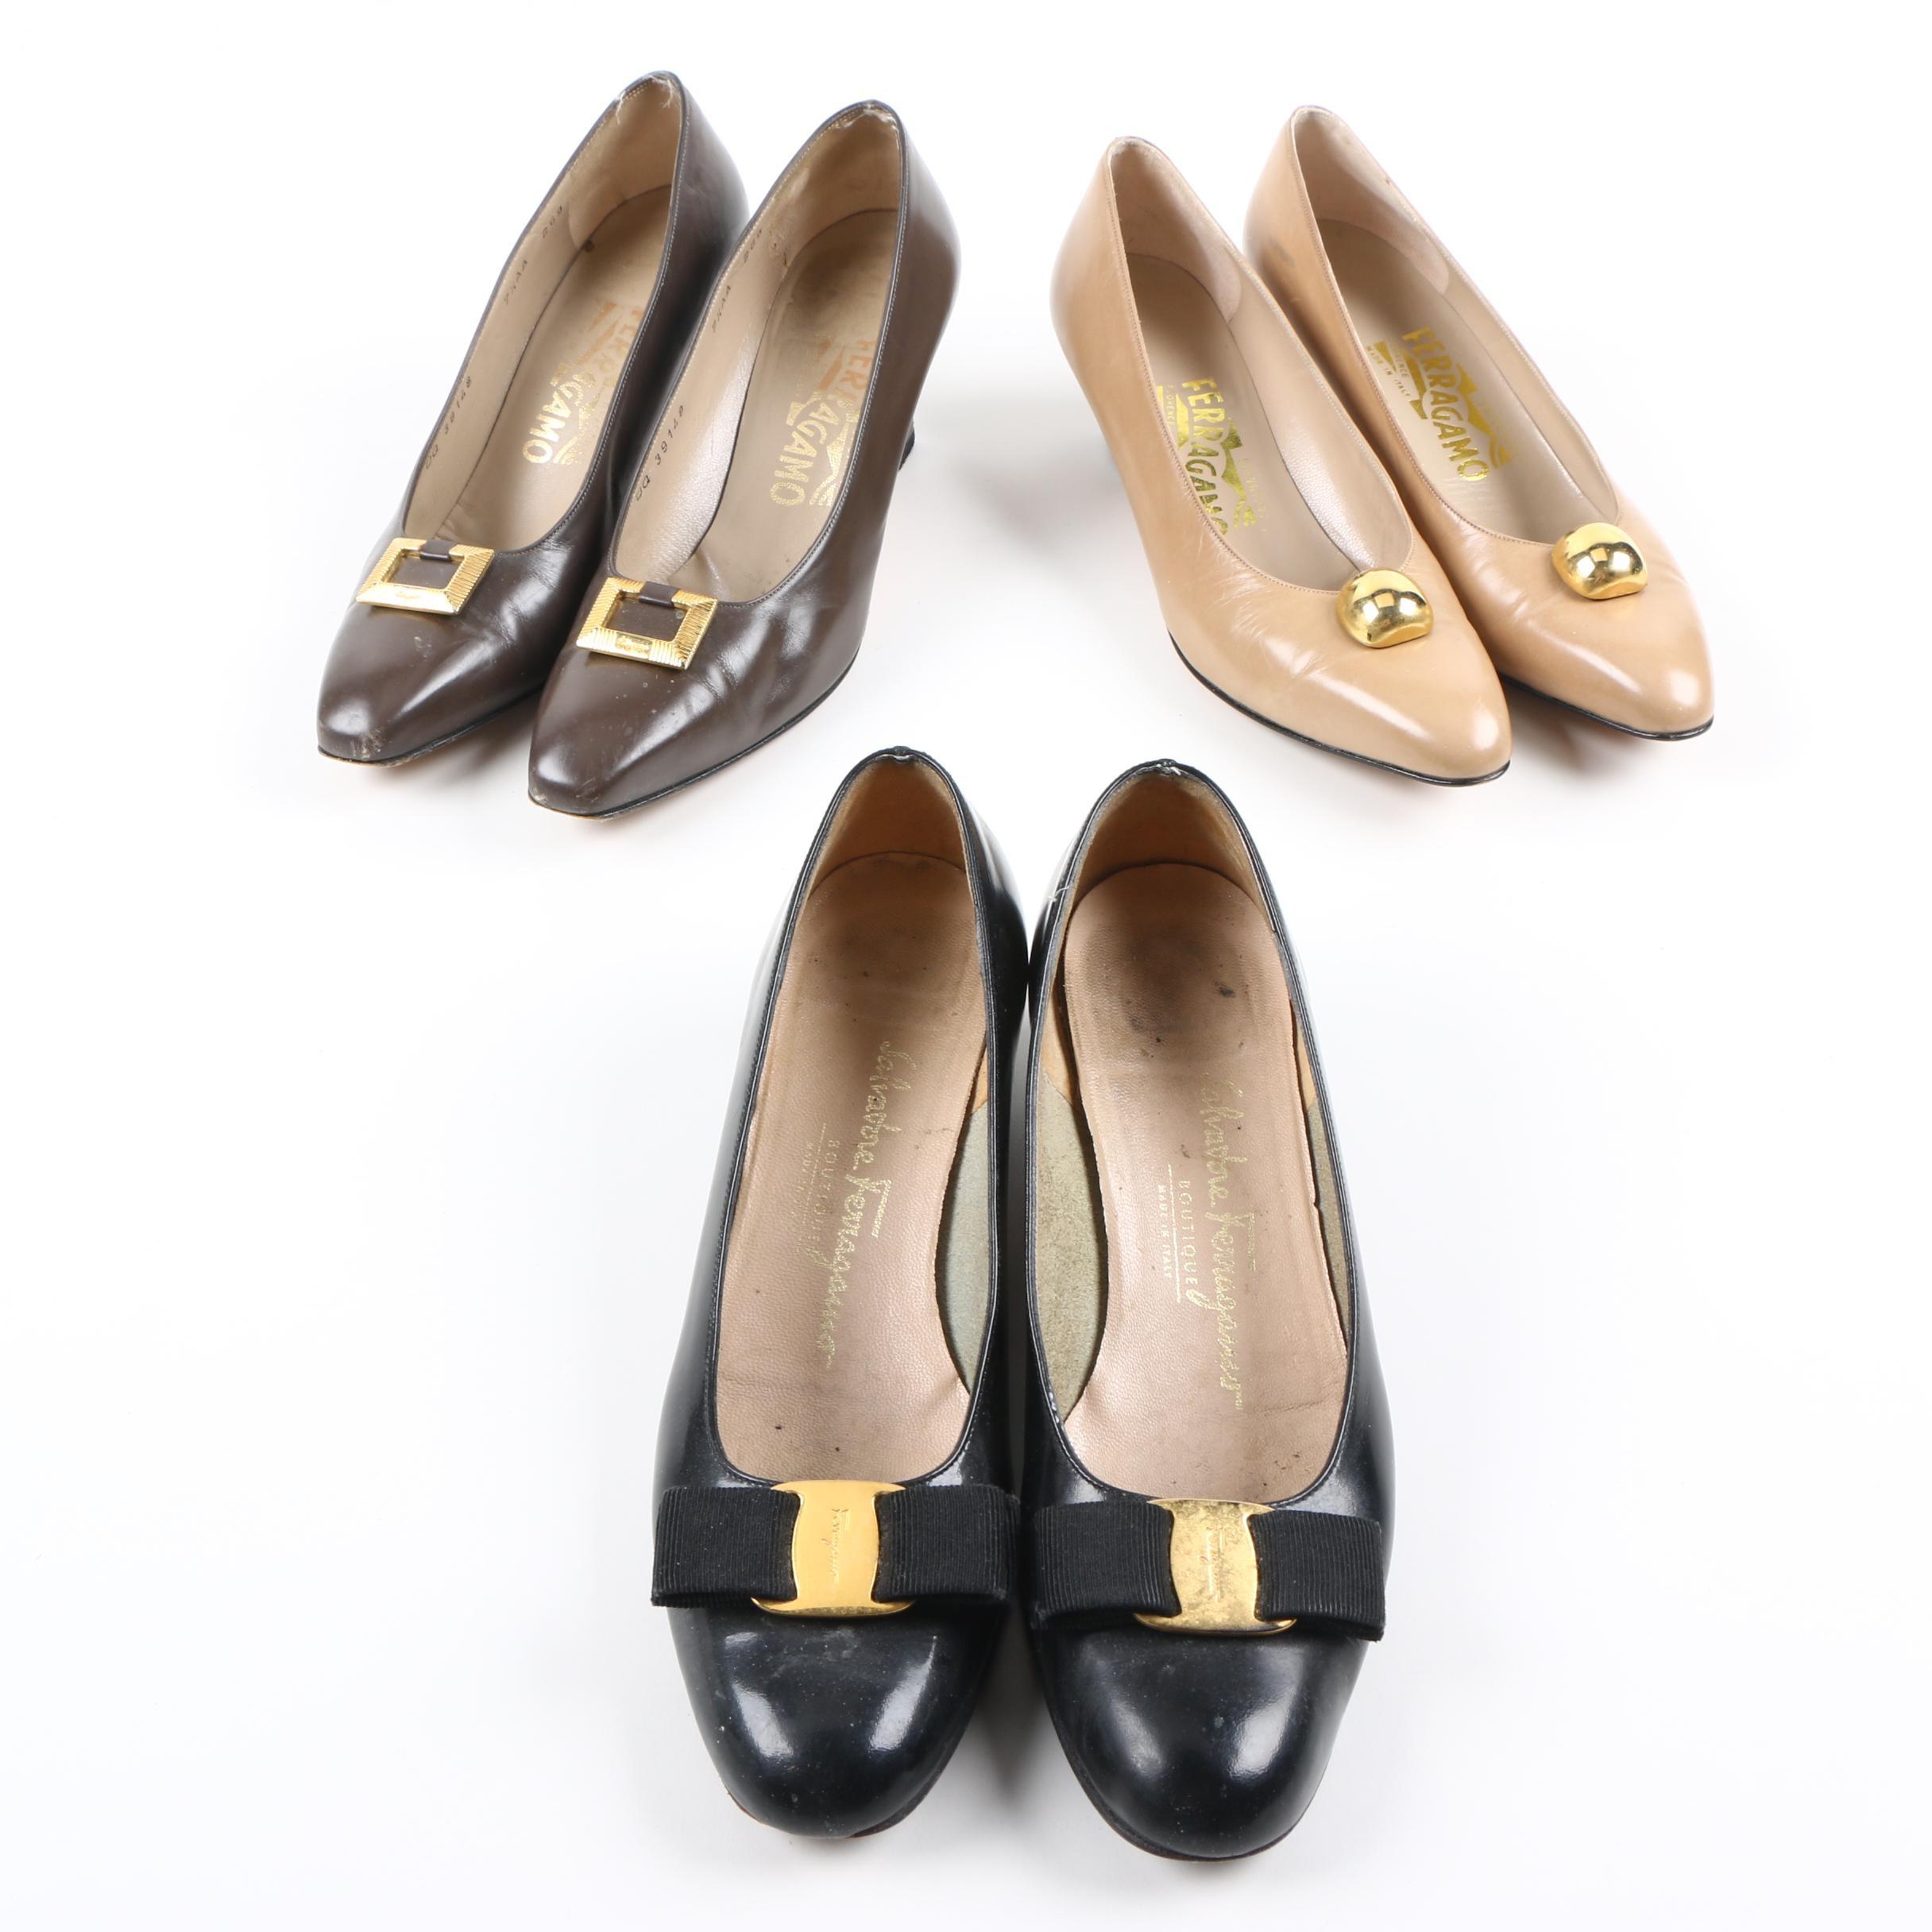 Vintage Salvatore Ferragamo Pump Heels